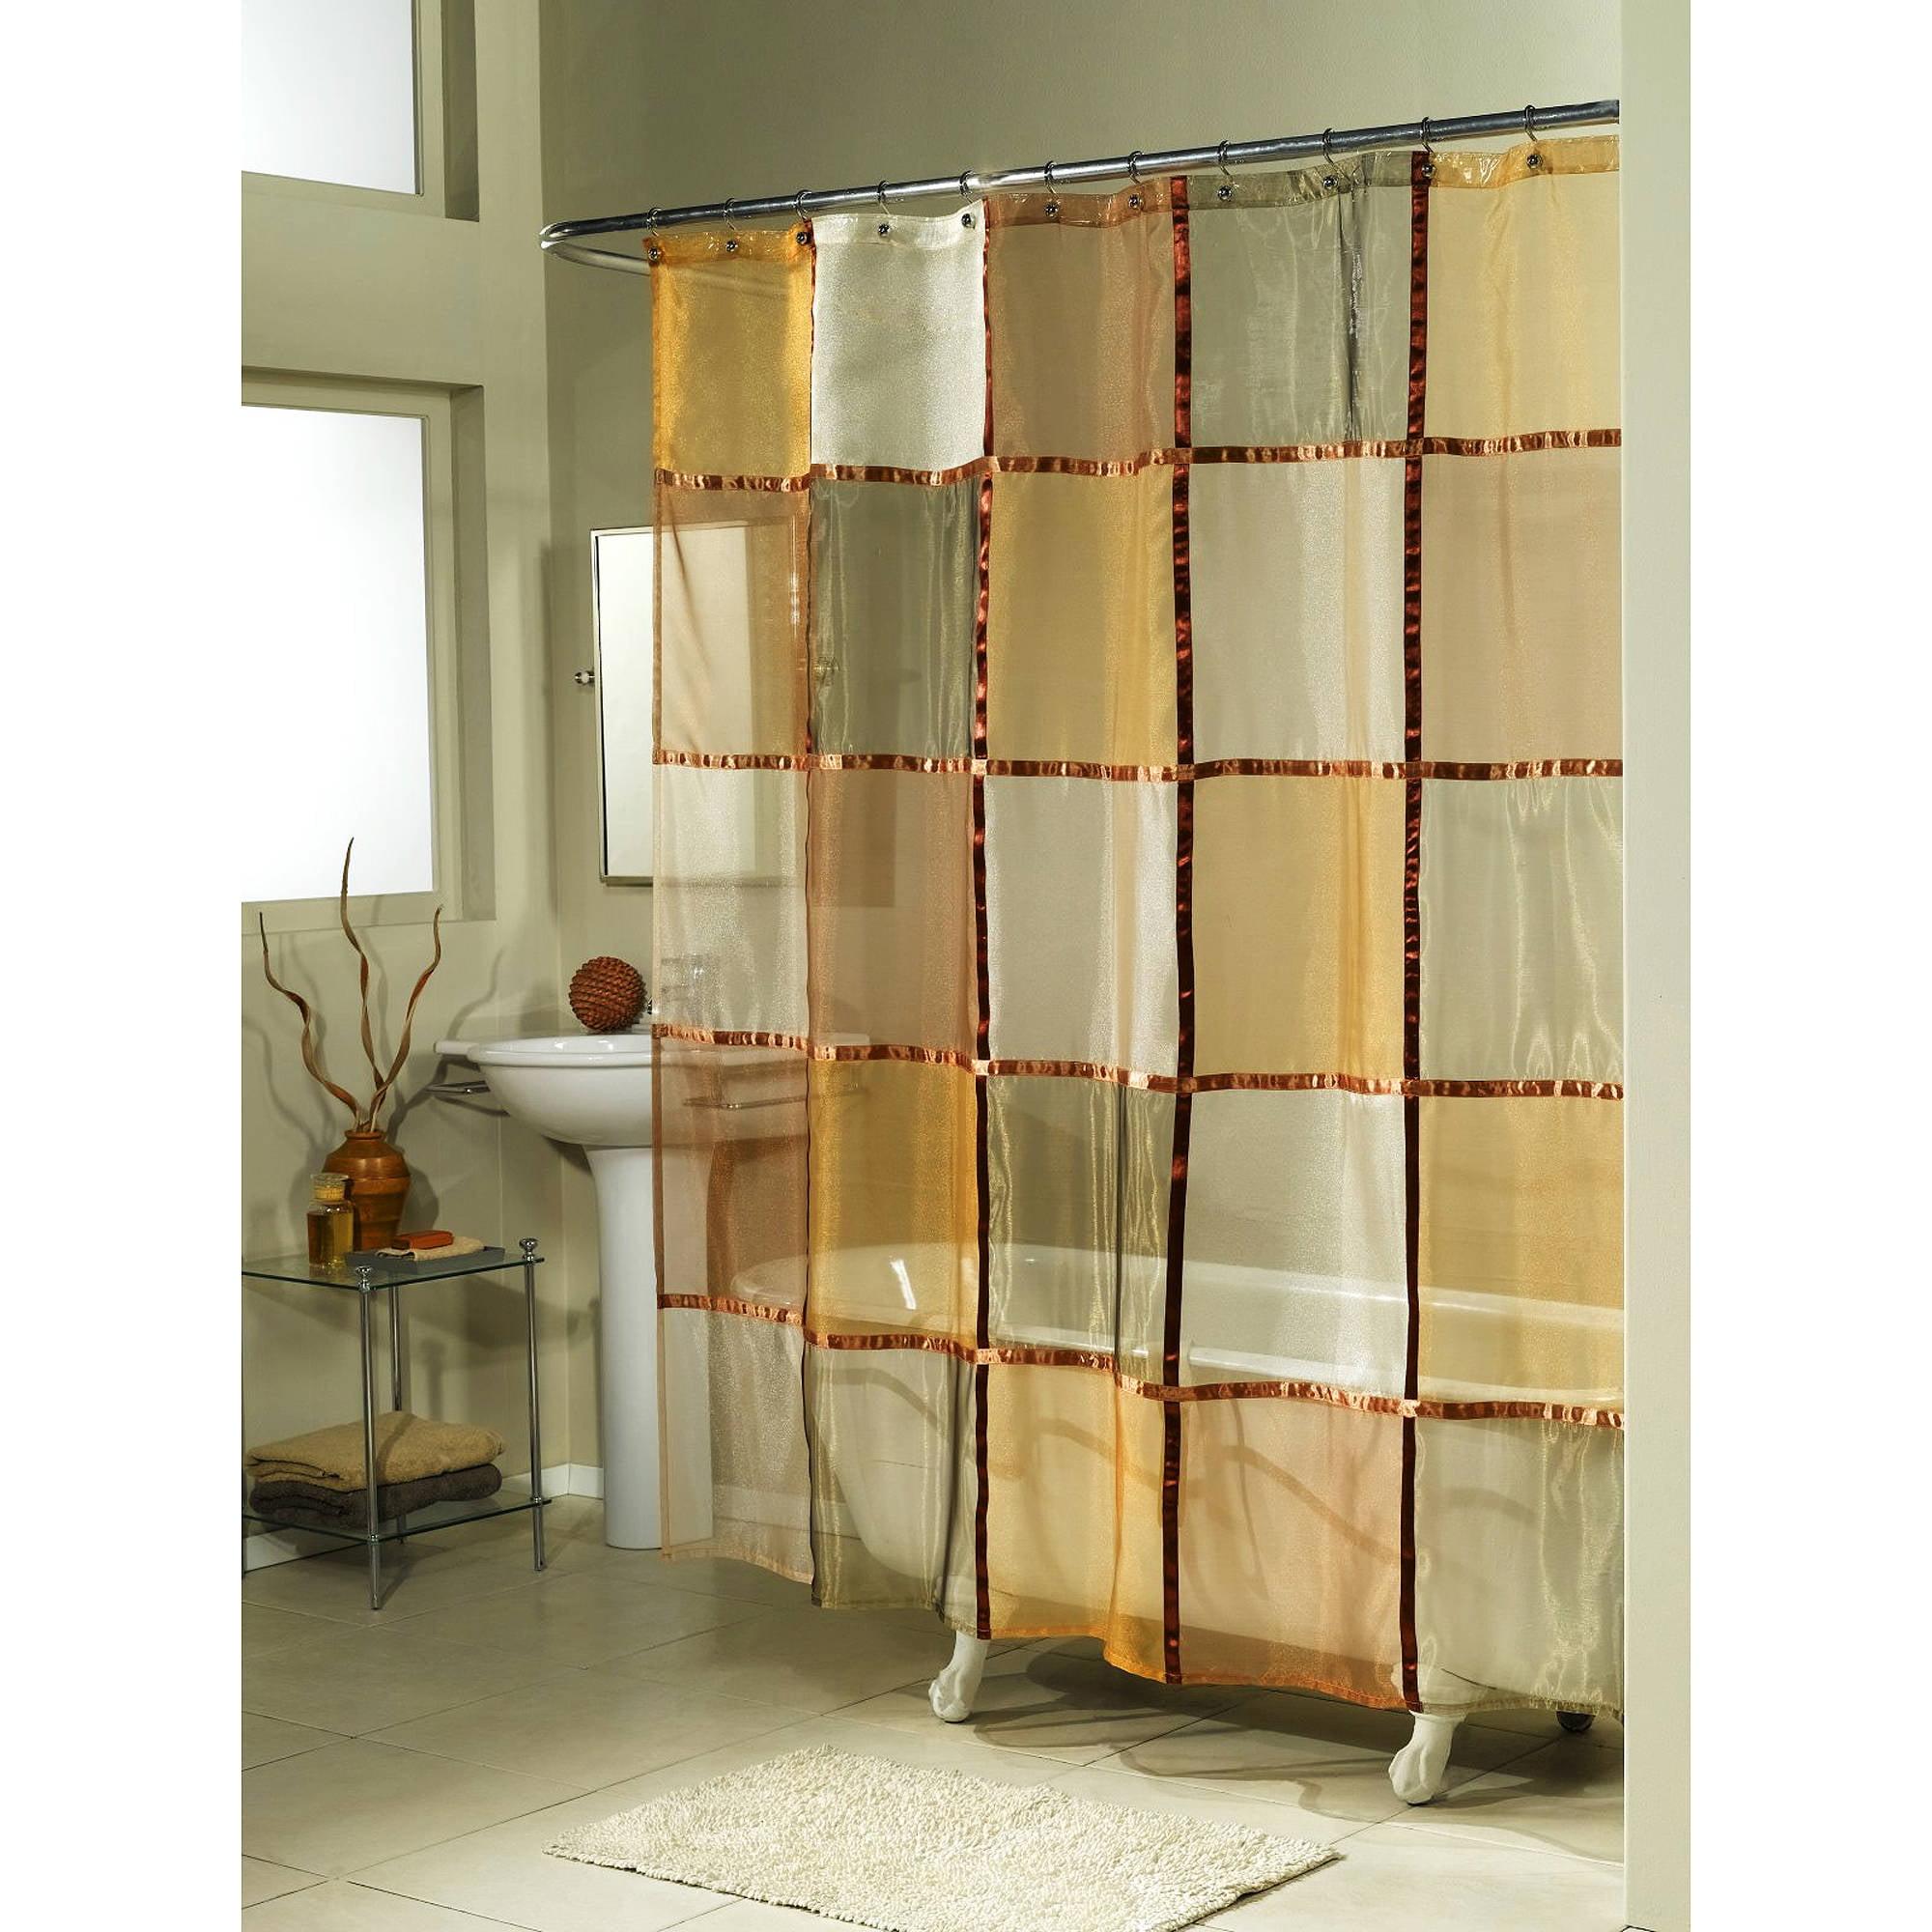 Ex-Cell Home Fashions Mosaic Fabric Shower Curtain, Terra Cotta